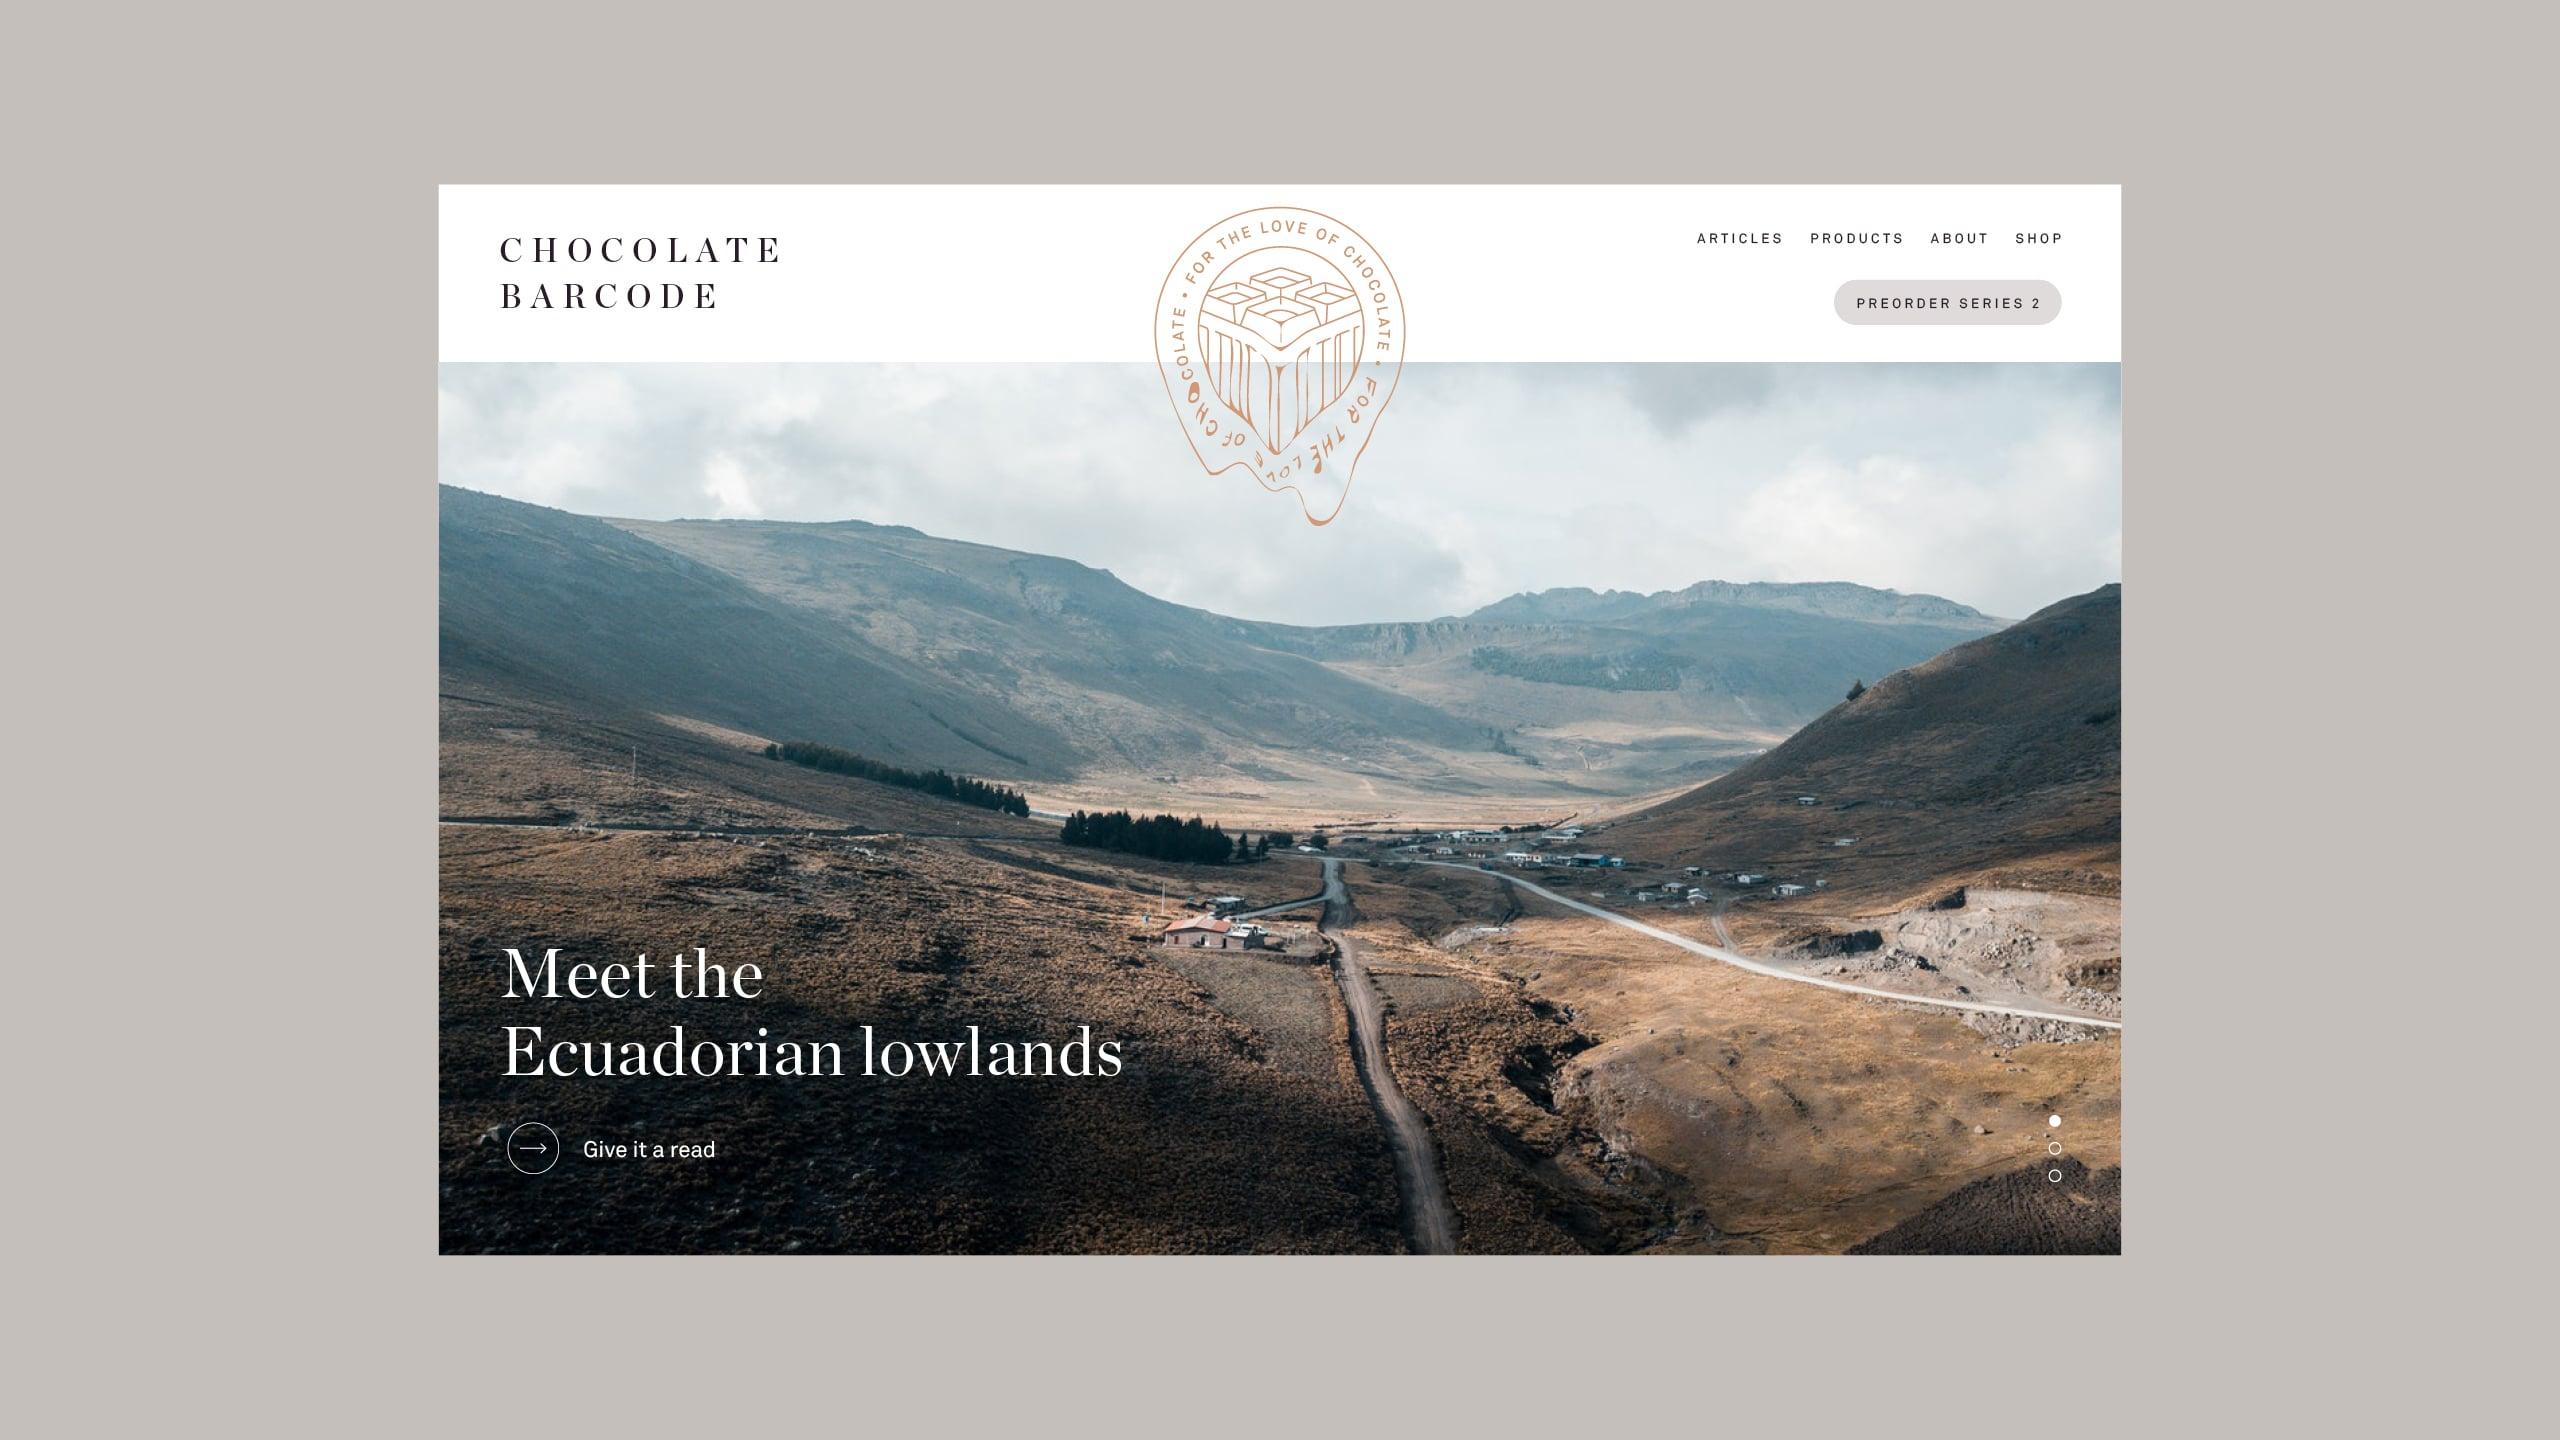 mantik-digital-branding-development-agency-chocolate-packaging-webdesign-design-12-min